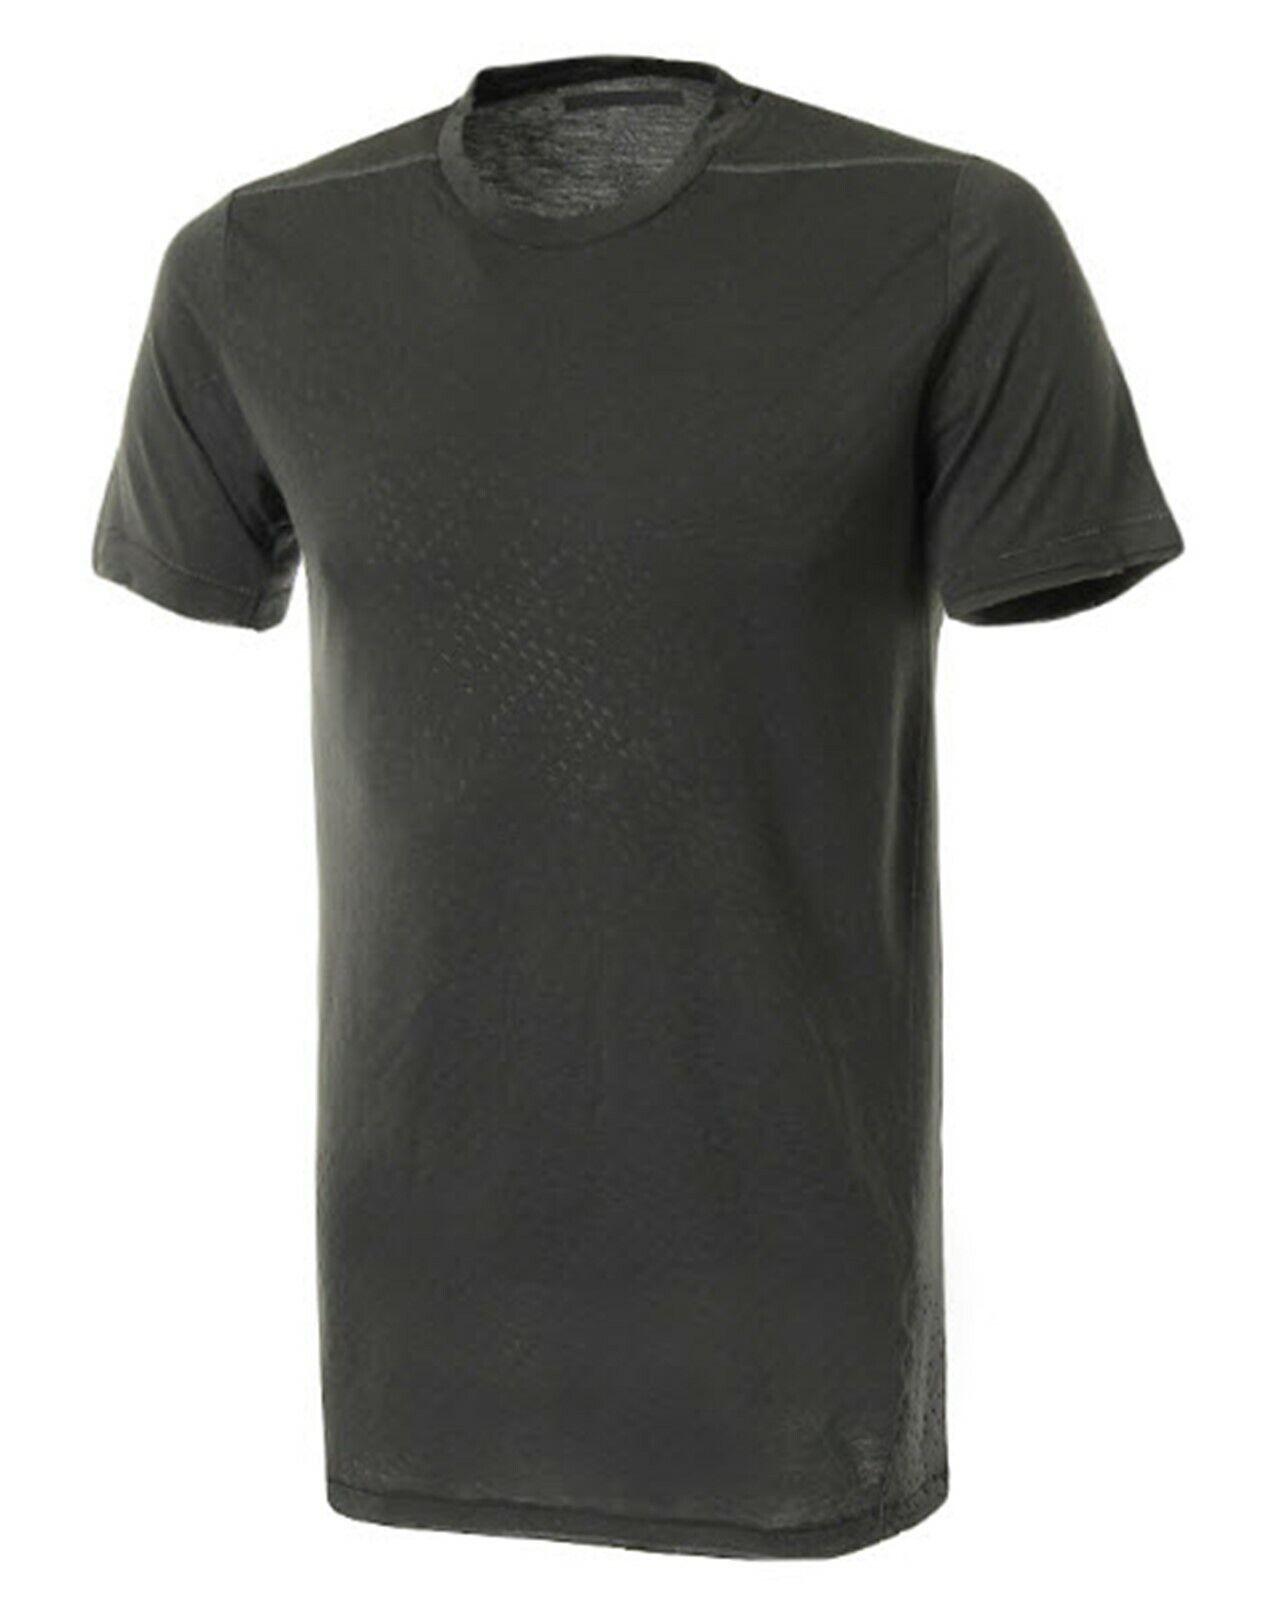 Adidas Men CHAOS Climalite Shirts Training Charcoal GYM Tee Shirt Jersey DQ2721